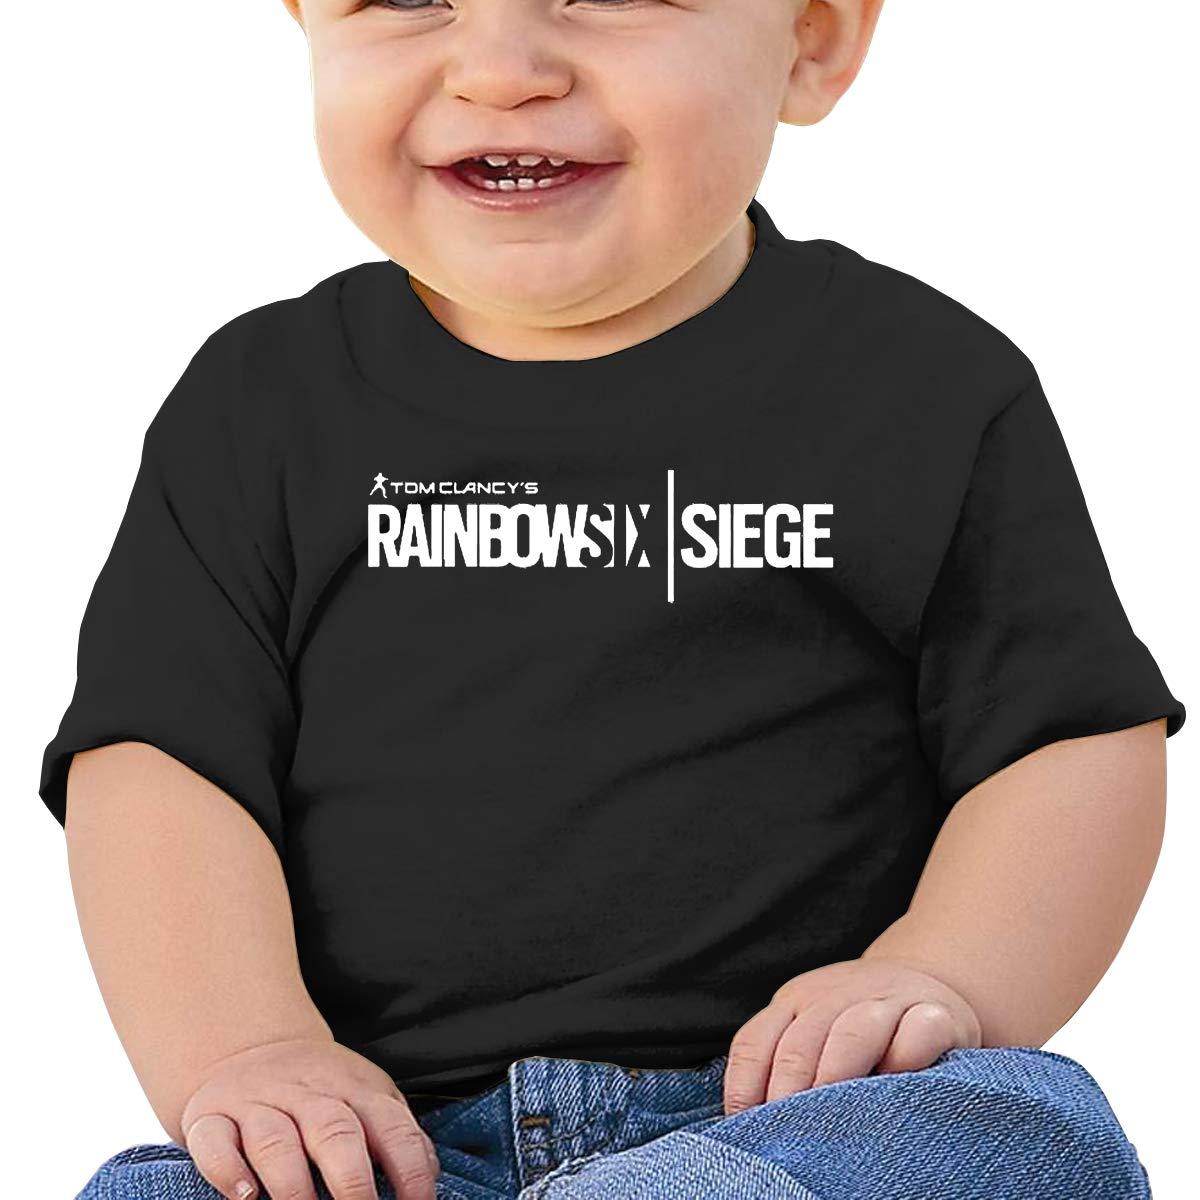 MONIKAL Unisex Infant Short Sleeve T-Shirt Rainbow-Six-Siege Toddler Kids Organic Cotton Graphic Tee Tops